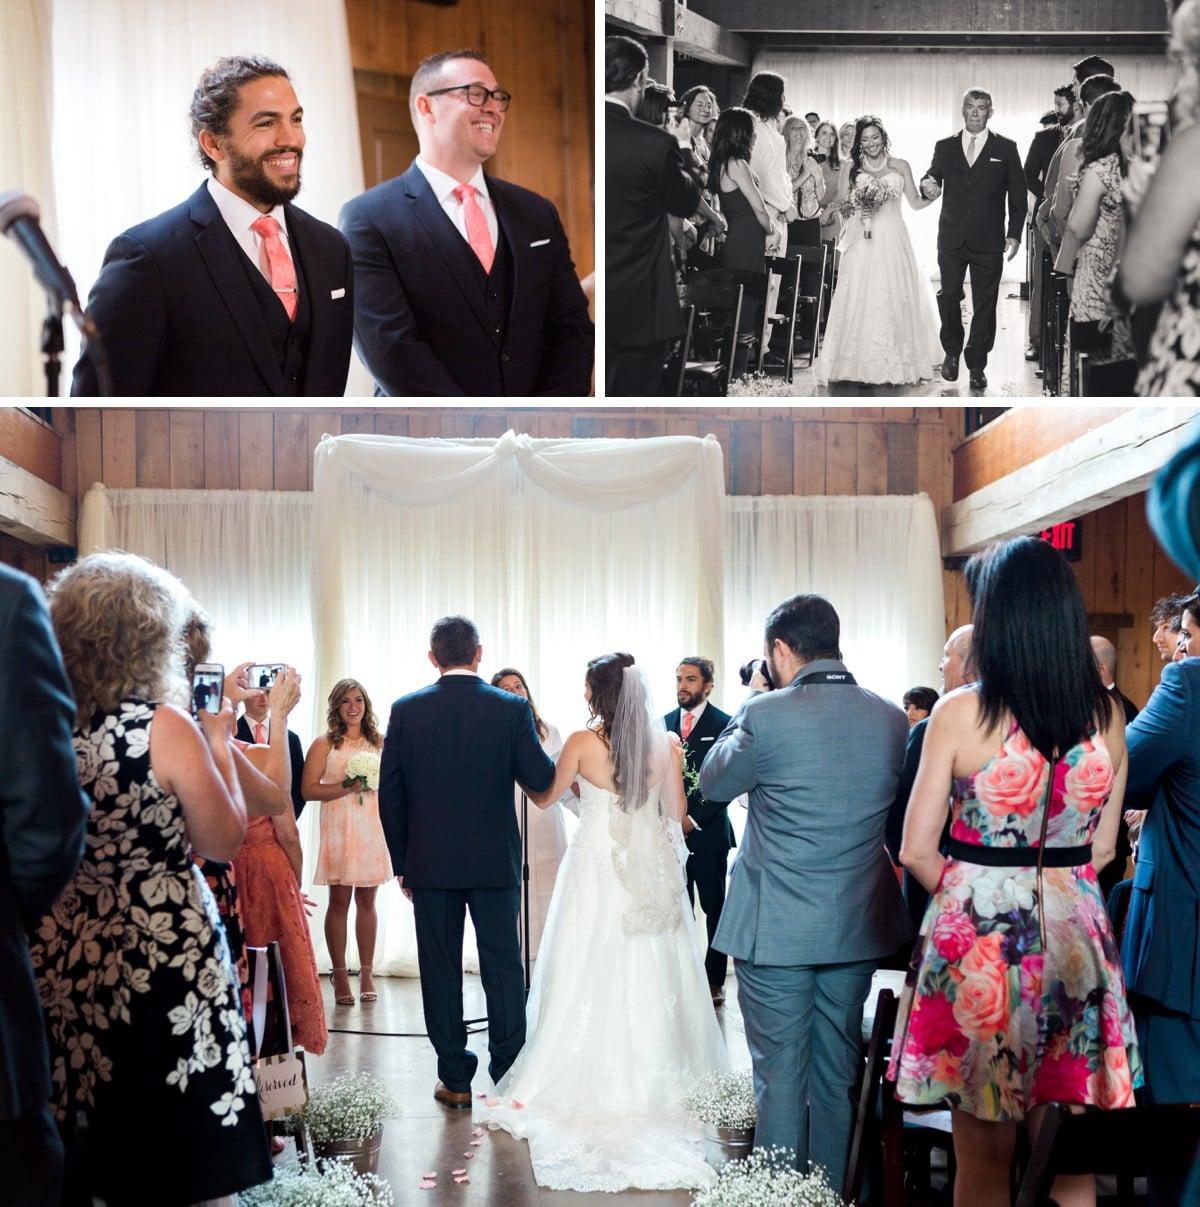 Nashville Green Door Gourmet Wedding, Nashville Wedding Photography, Wedding Ceremony